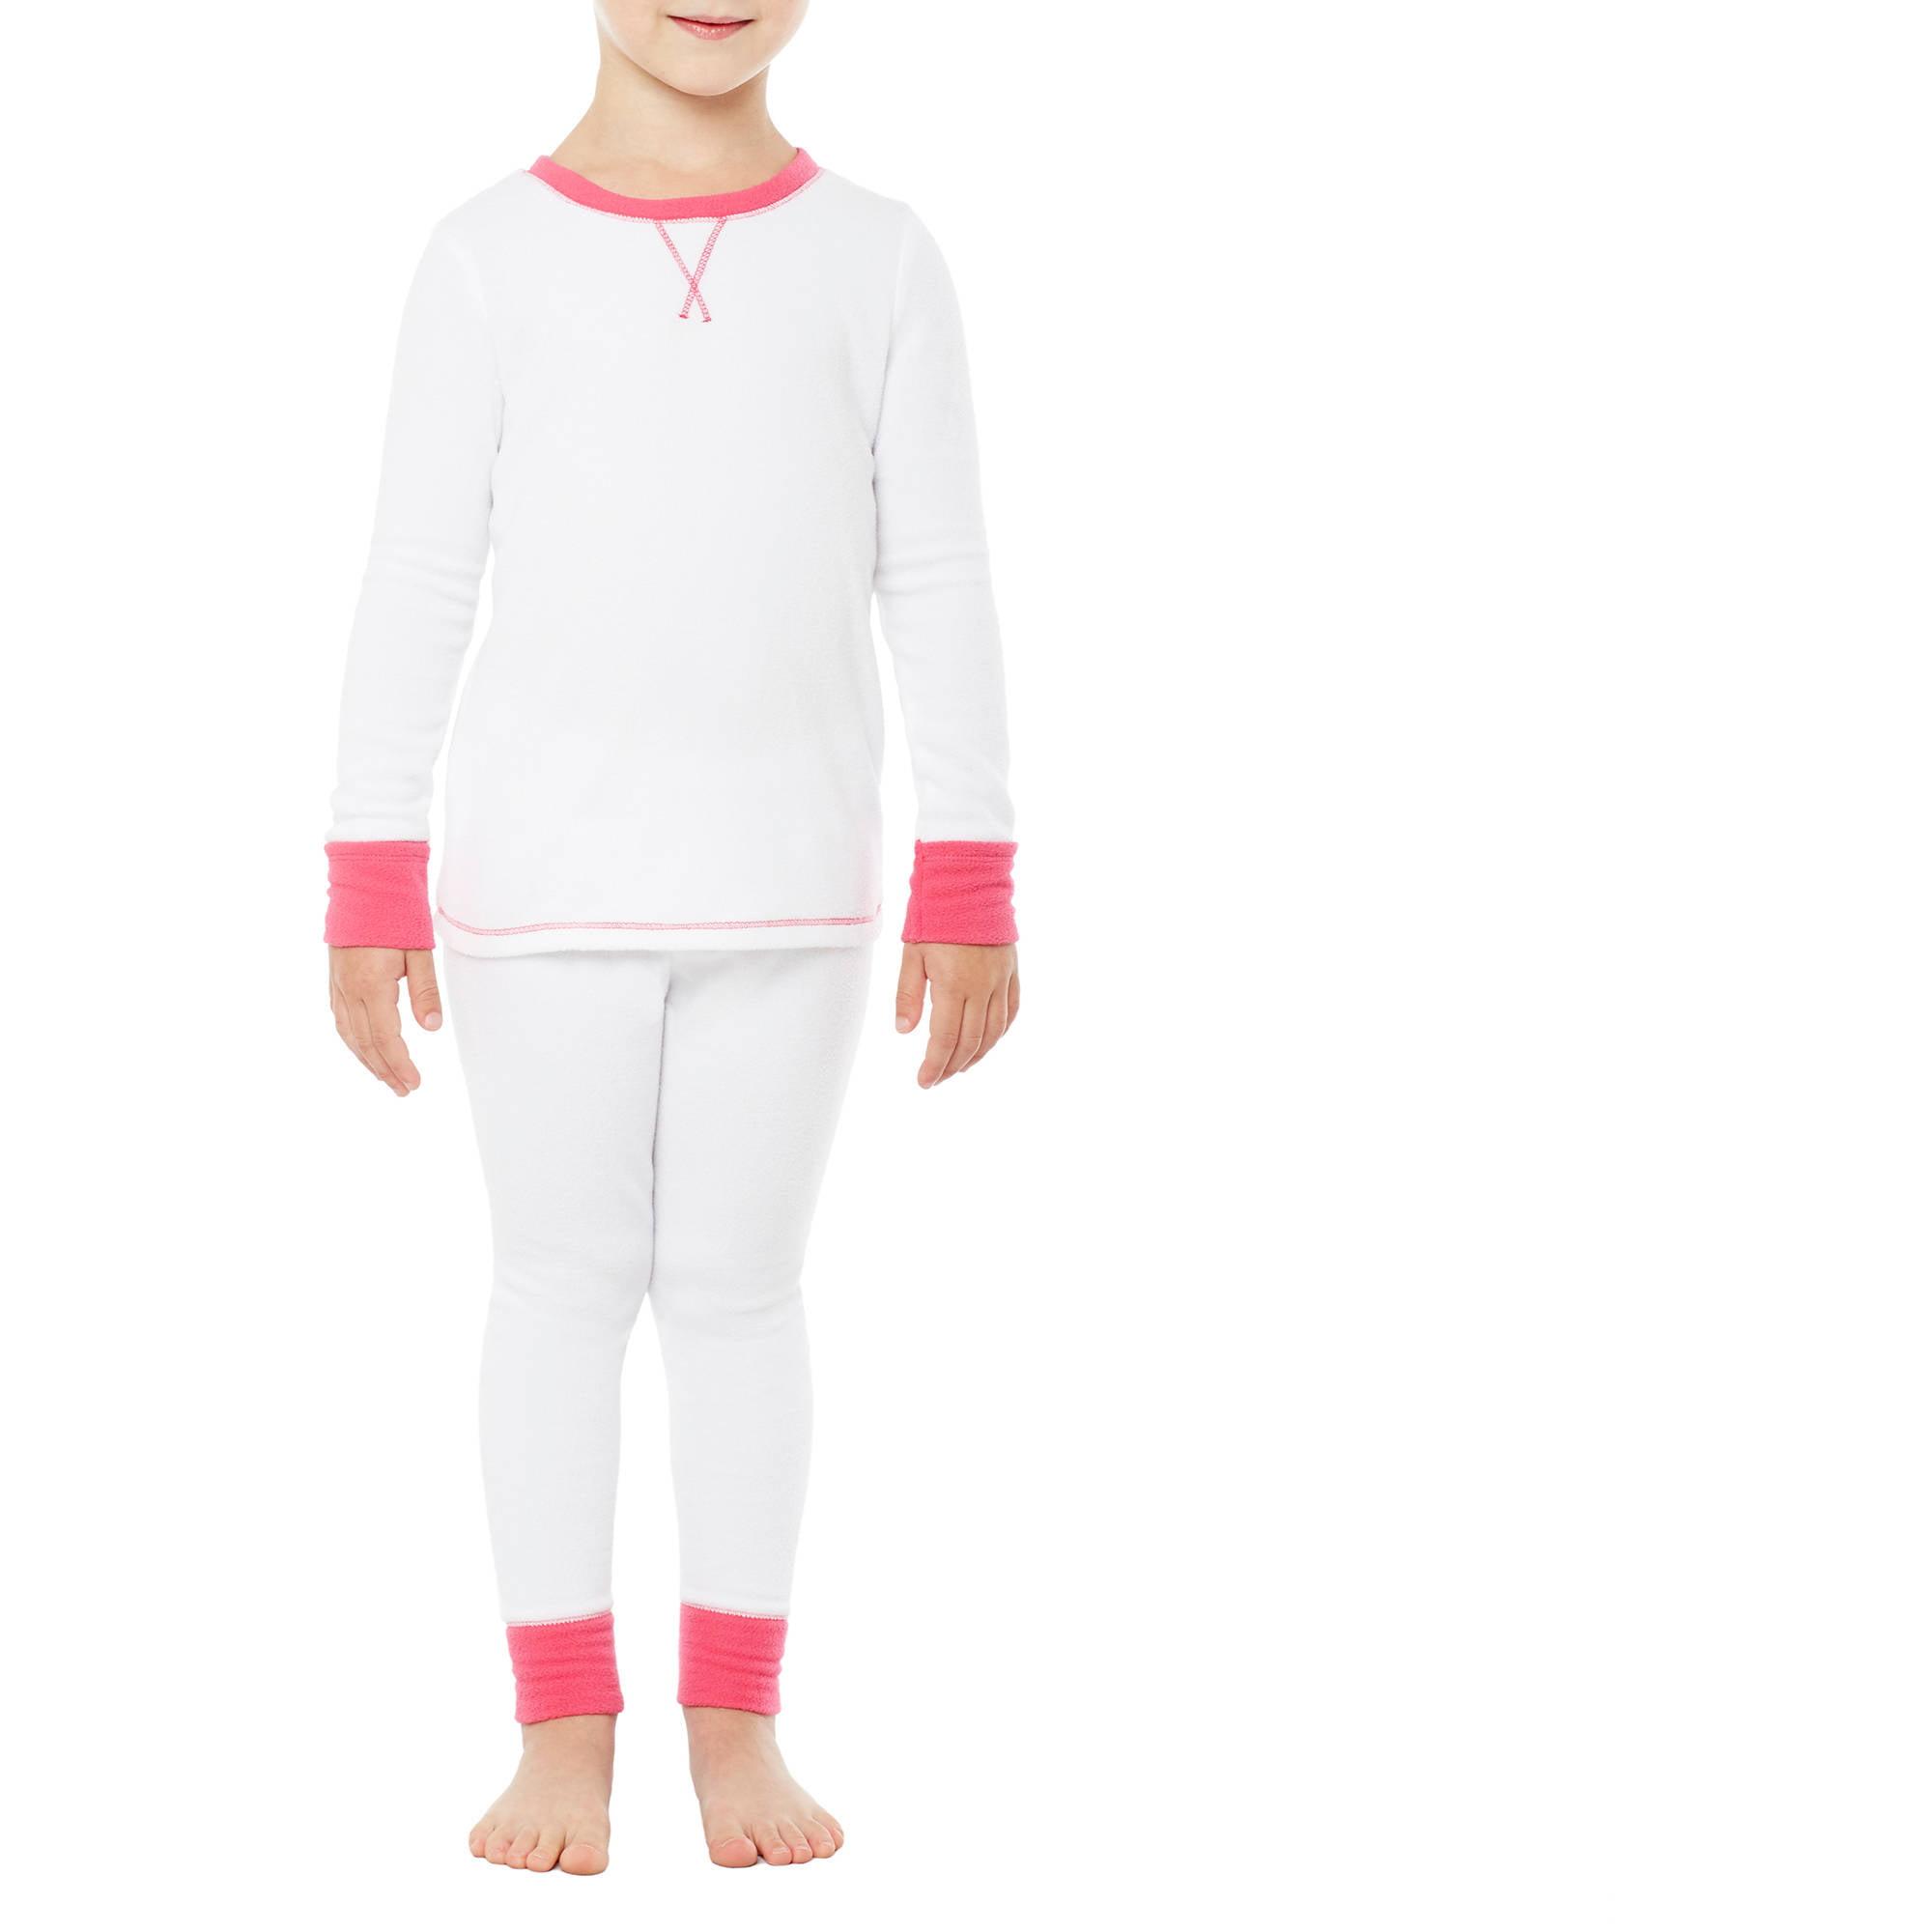 Climate Right by Cuddl Duds Toddler Girl Fleece Warm Underwear 2 PC set